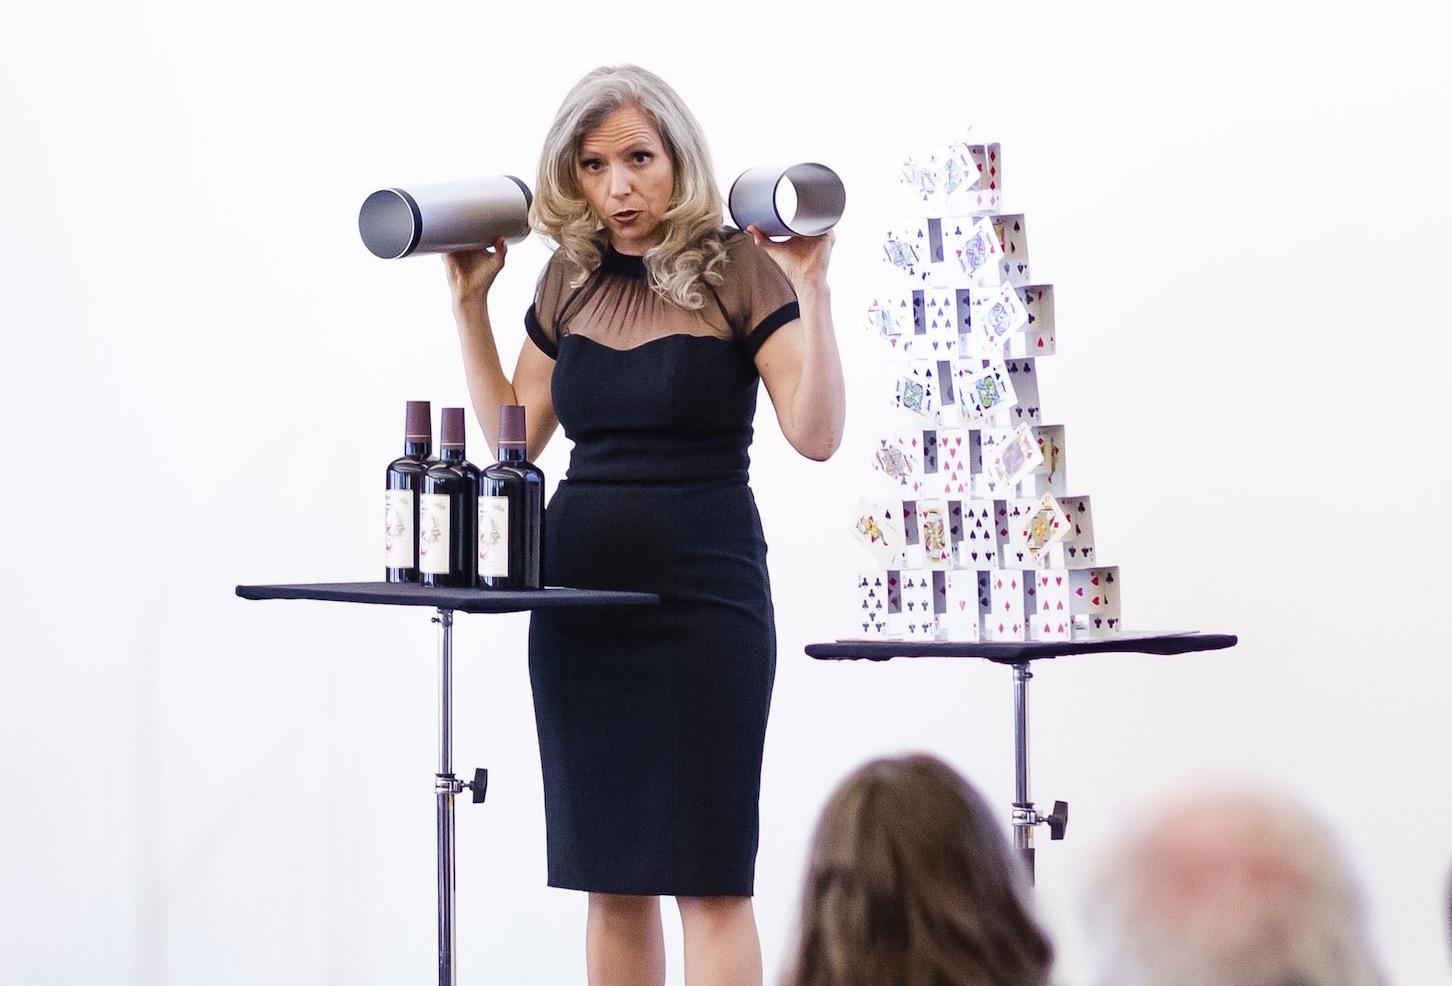 www.HeatherMagic.com_Heather-Rogers_Magician_Speaker_Trainer_Mentalist_Epigenetics_Coach.UC Berkeley Cyber Security Summit, Heather Rogers, Speaker Magician.jpg